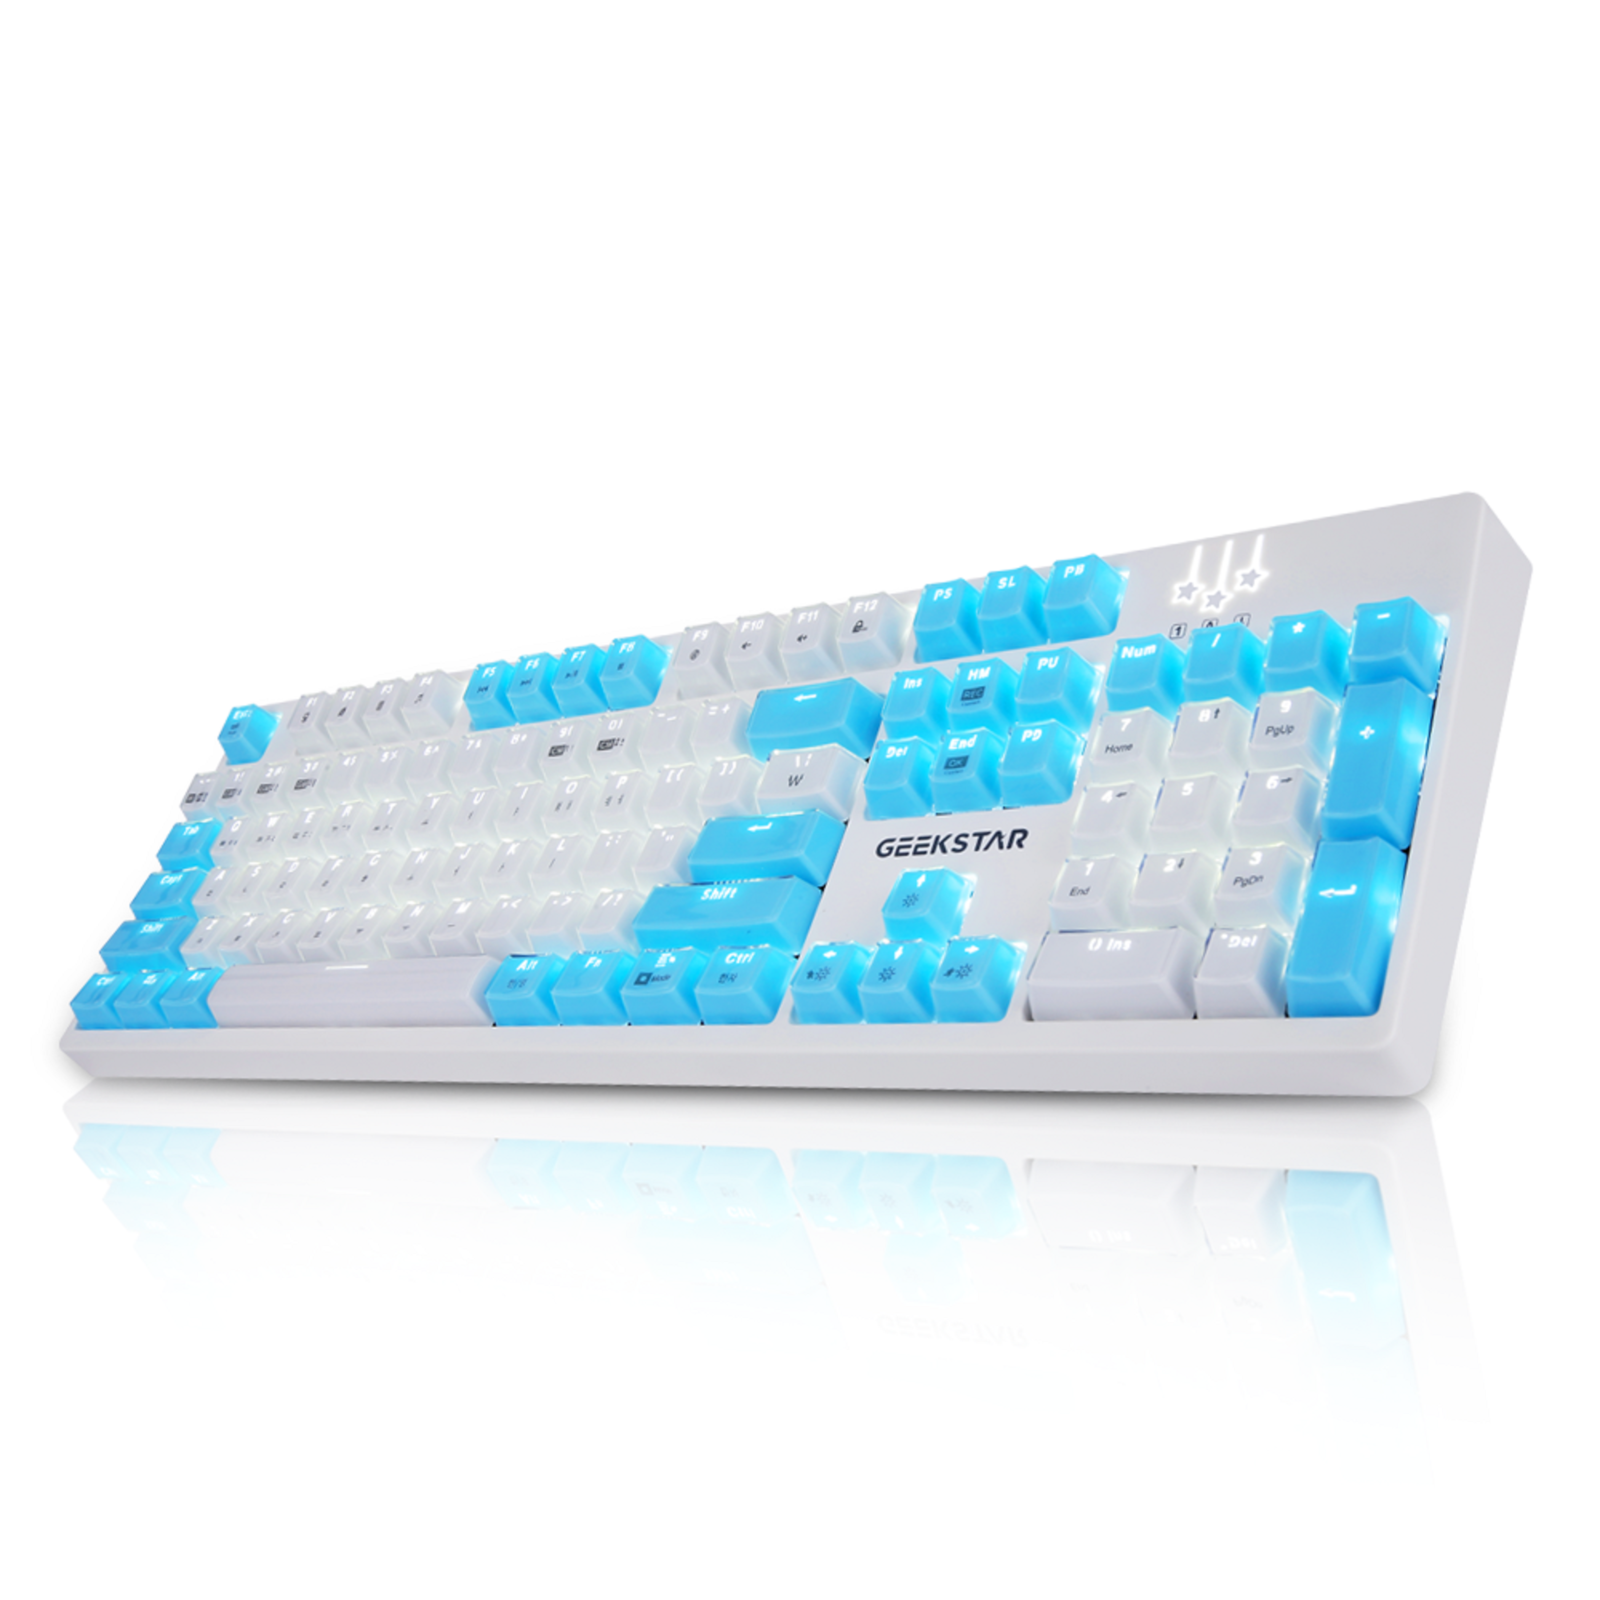 Geekstar gk802 2 keyboard 02